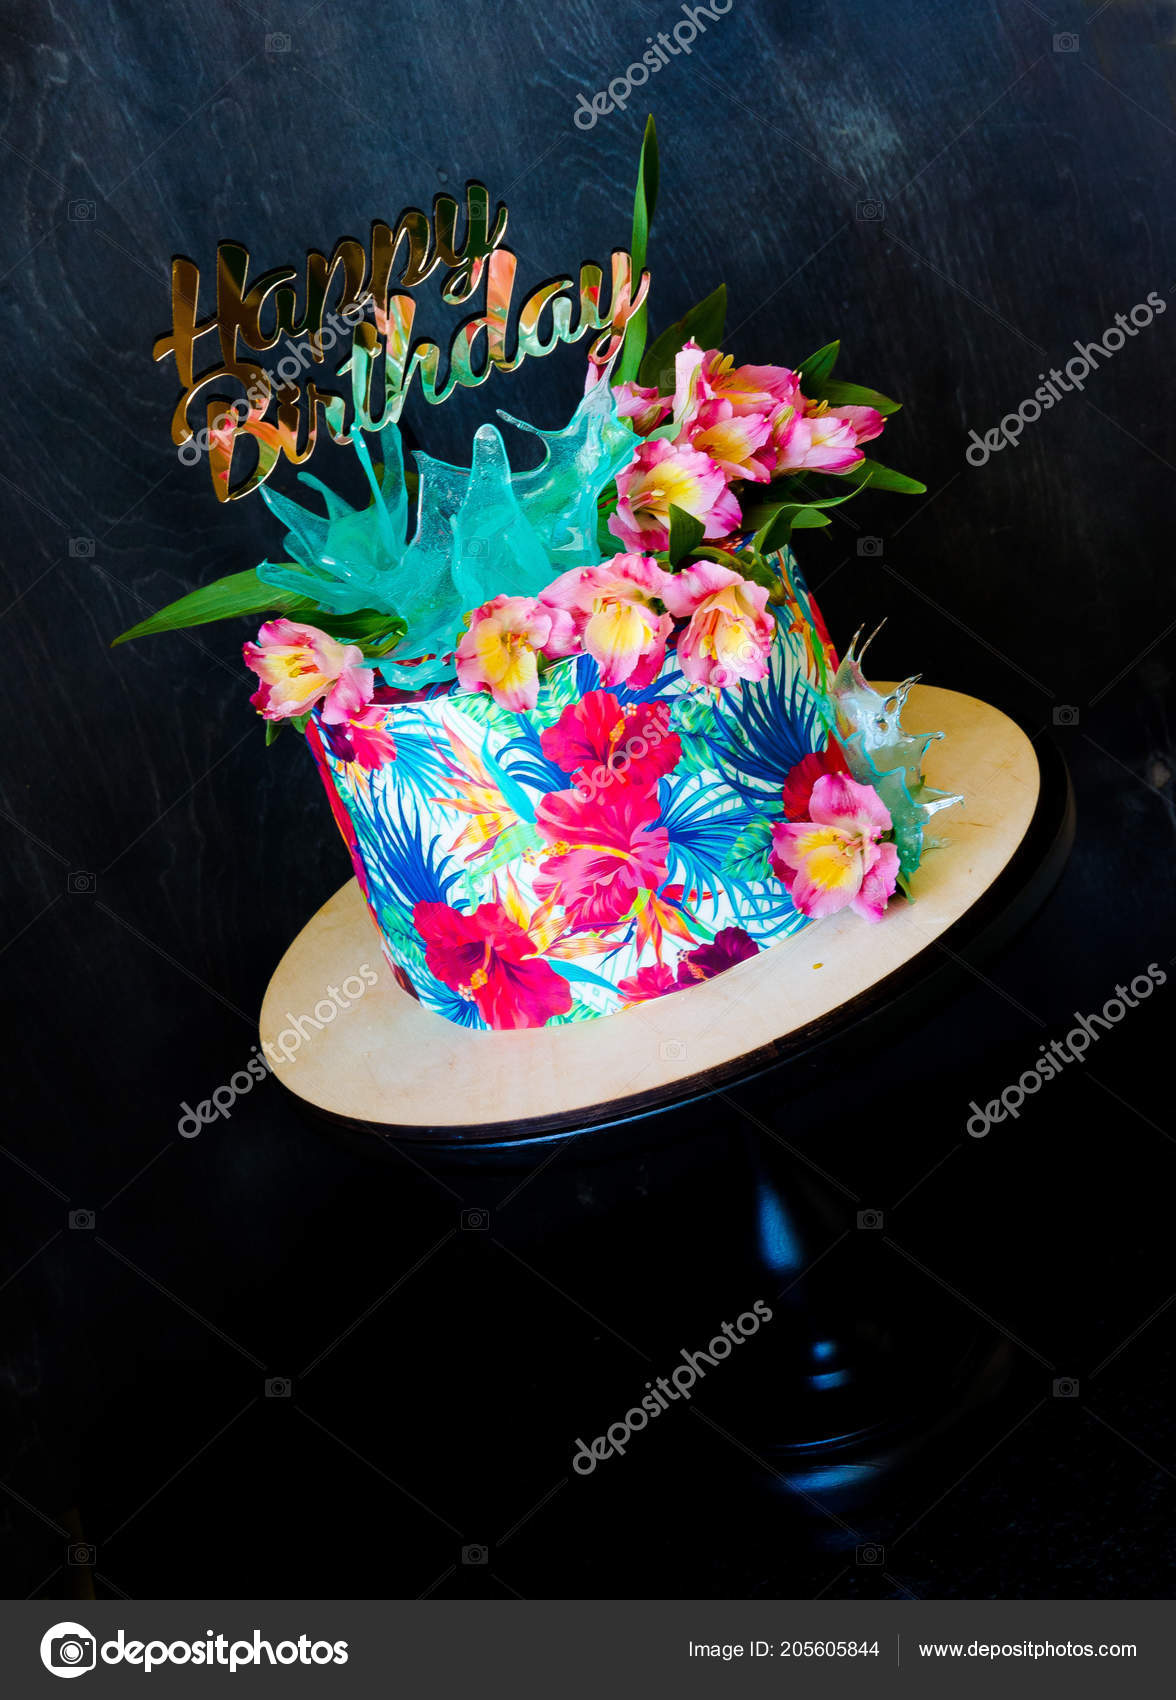 Tremendous Tropical Birthday Cake Cakestand Topper Stock Photo C Tusya119 Birthday Cards Printable Trancafe Filternl